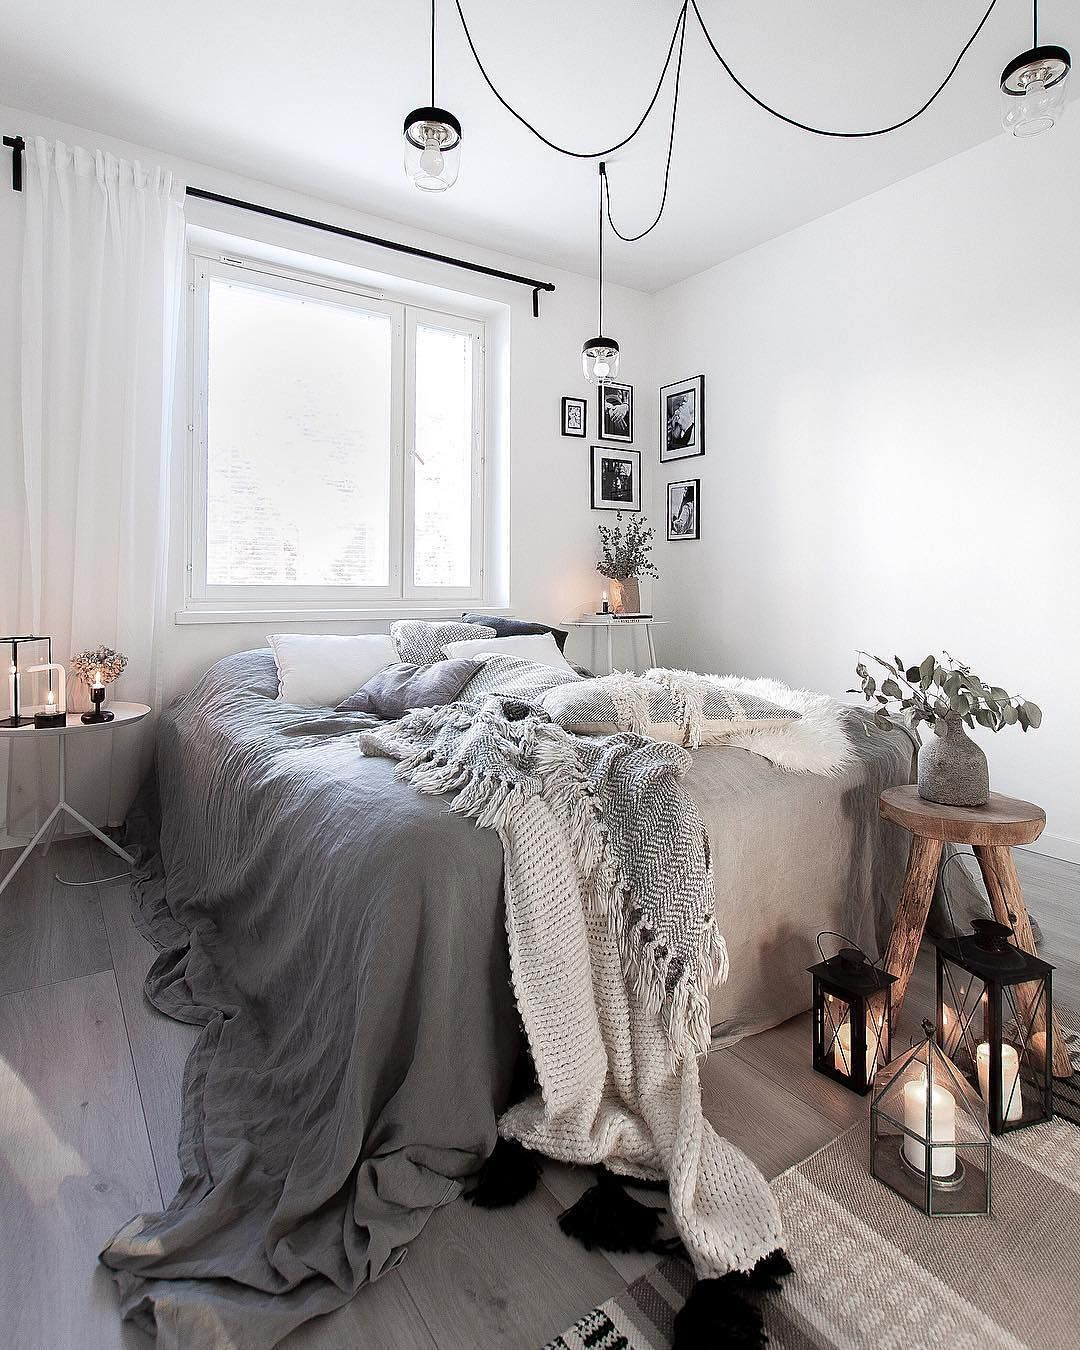 Roomporn On Instagram What Do You Think Of This Cozy Scandinavian Bedroom We Love 2xil Bohemian Style Interior Design Bedroom Design Romantic Bedroom Decor